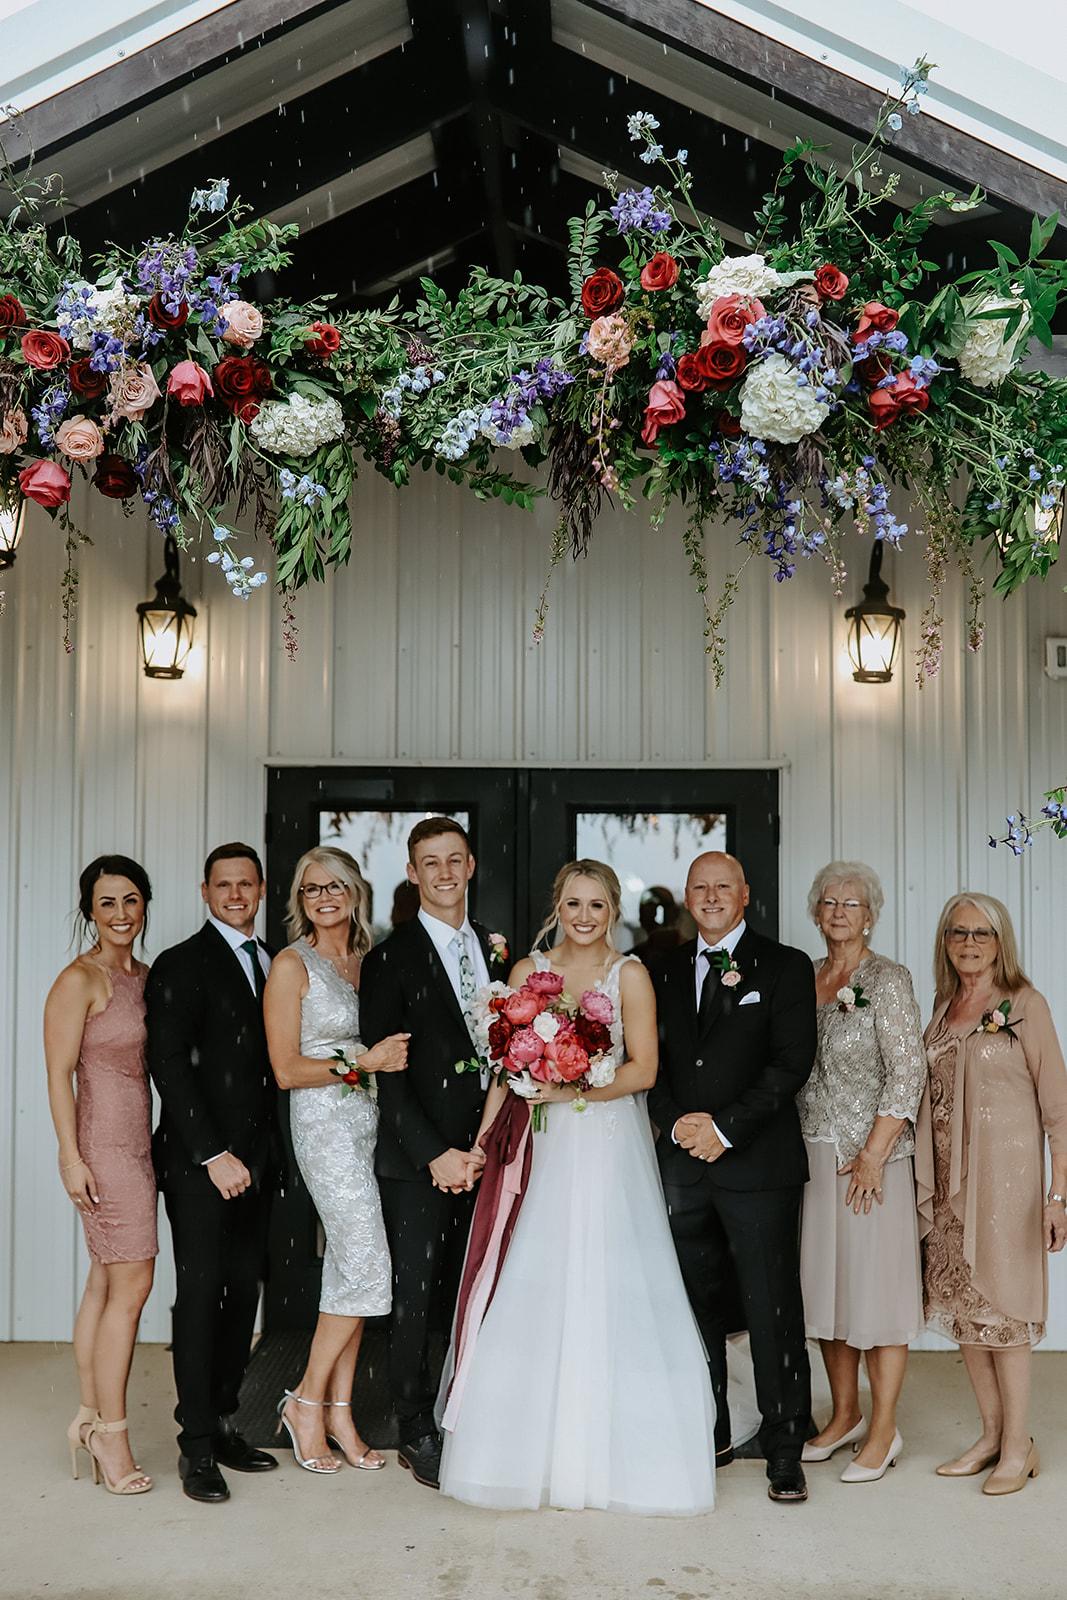 Oklahoma Outdoor Wedding Tulsa White Barn Venue 74.jpg